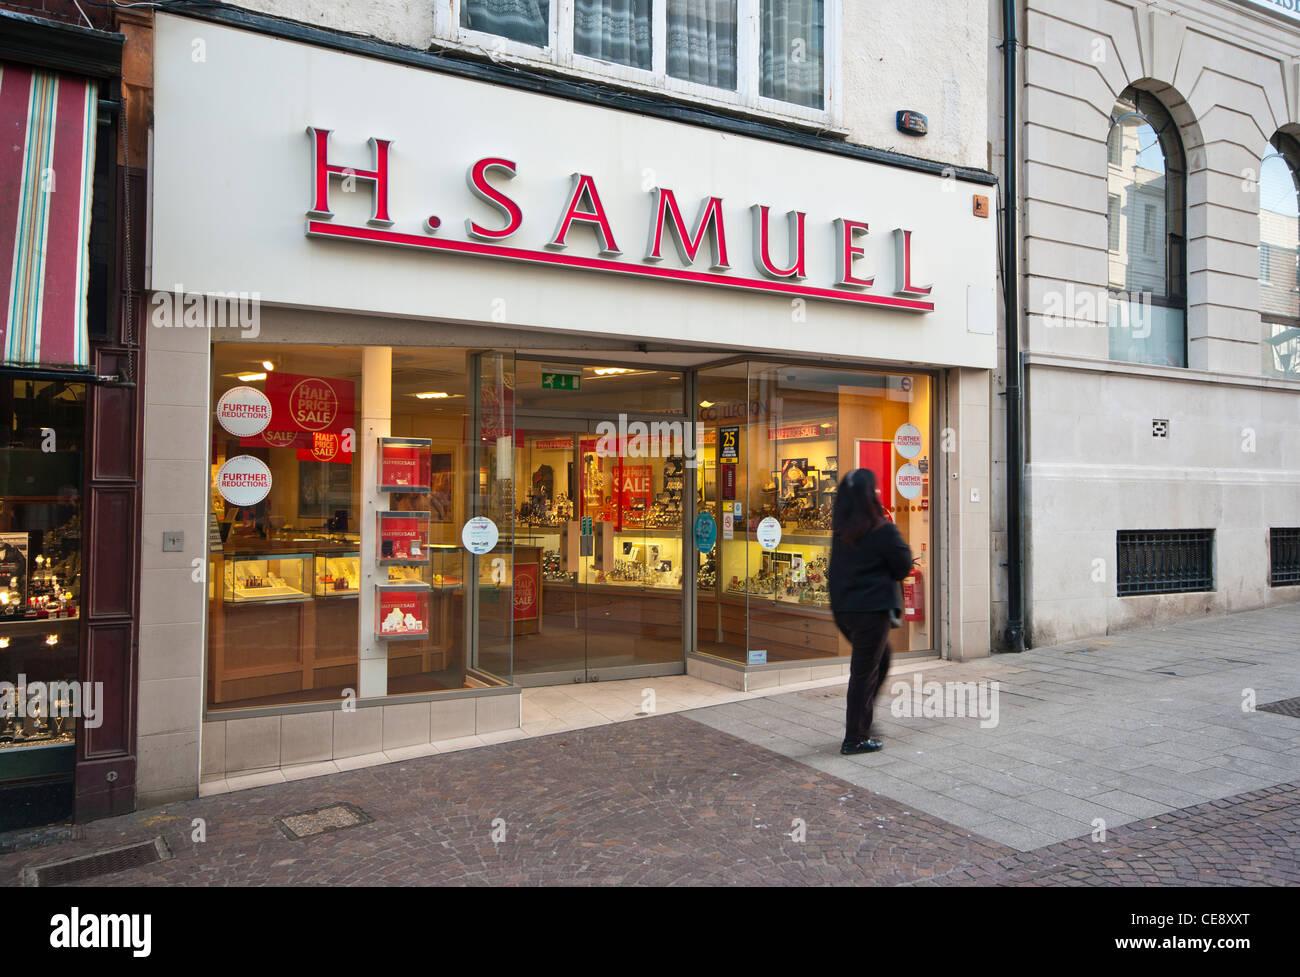 H Samuel High Street Jewellers Jewelers Jeweller Jeweler With Sale Signs UK - Stock Image